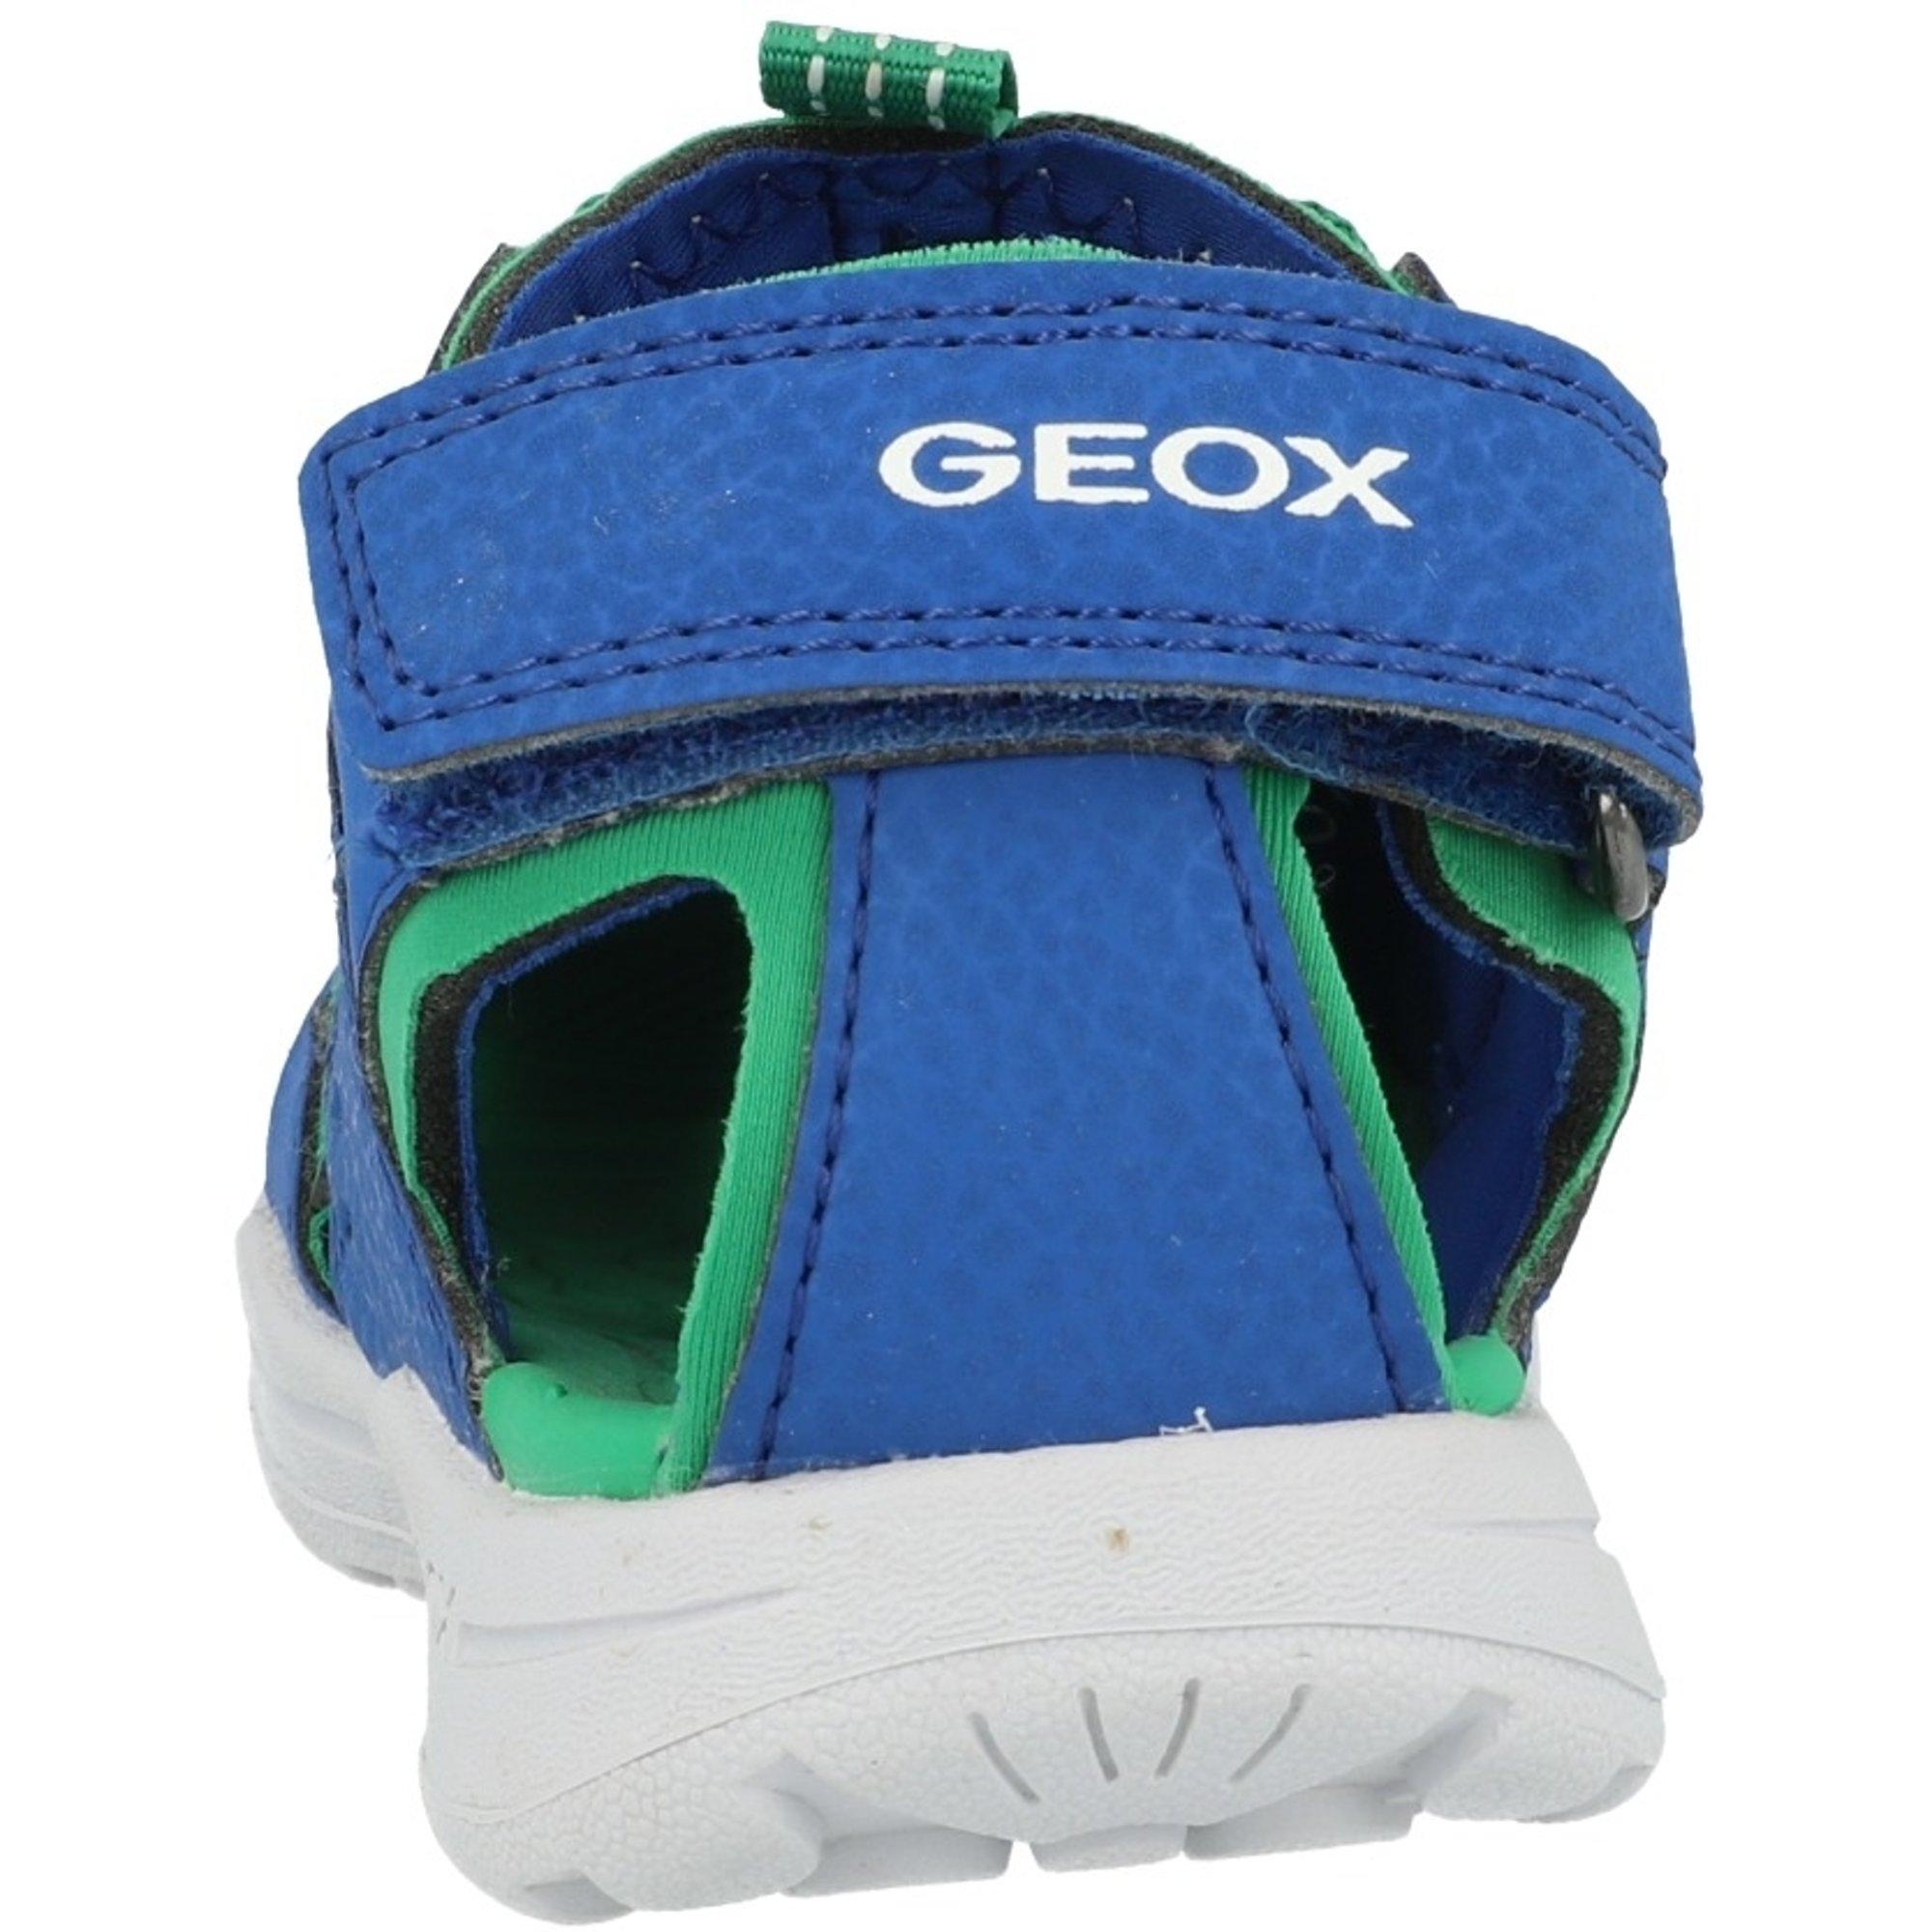 Geox J Vaniett B Royal/Green Durabuck